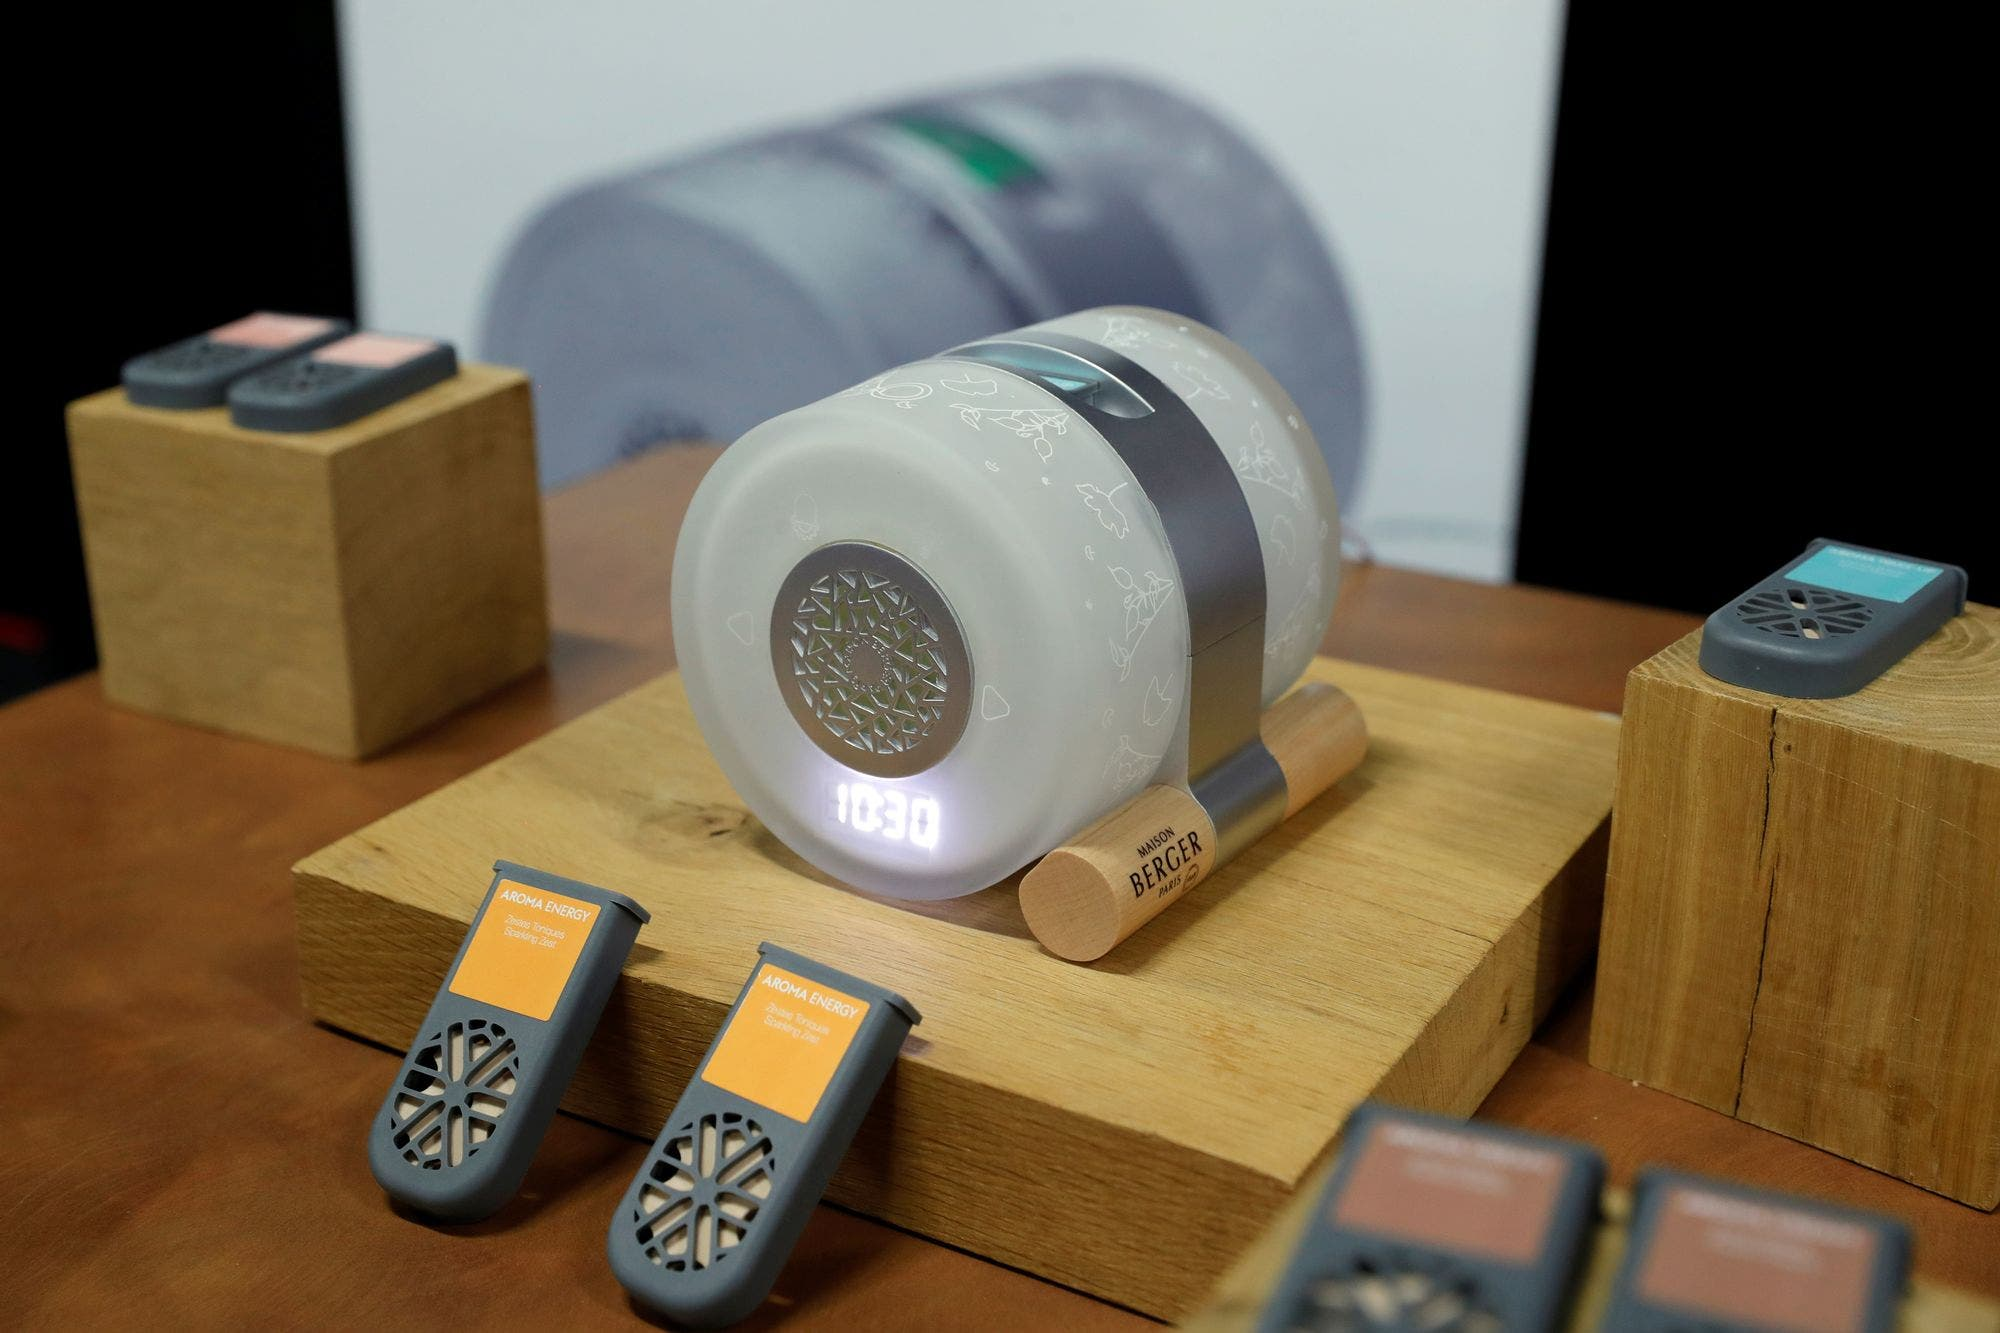 CES 2020: Presentan un reloj despertador que usa aromas como complemento de la alarma